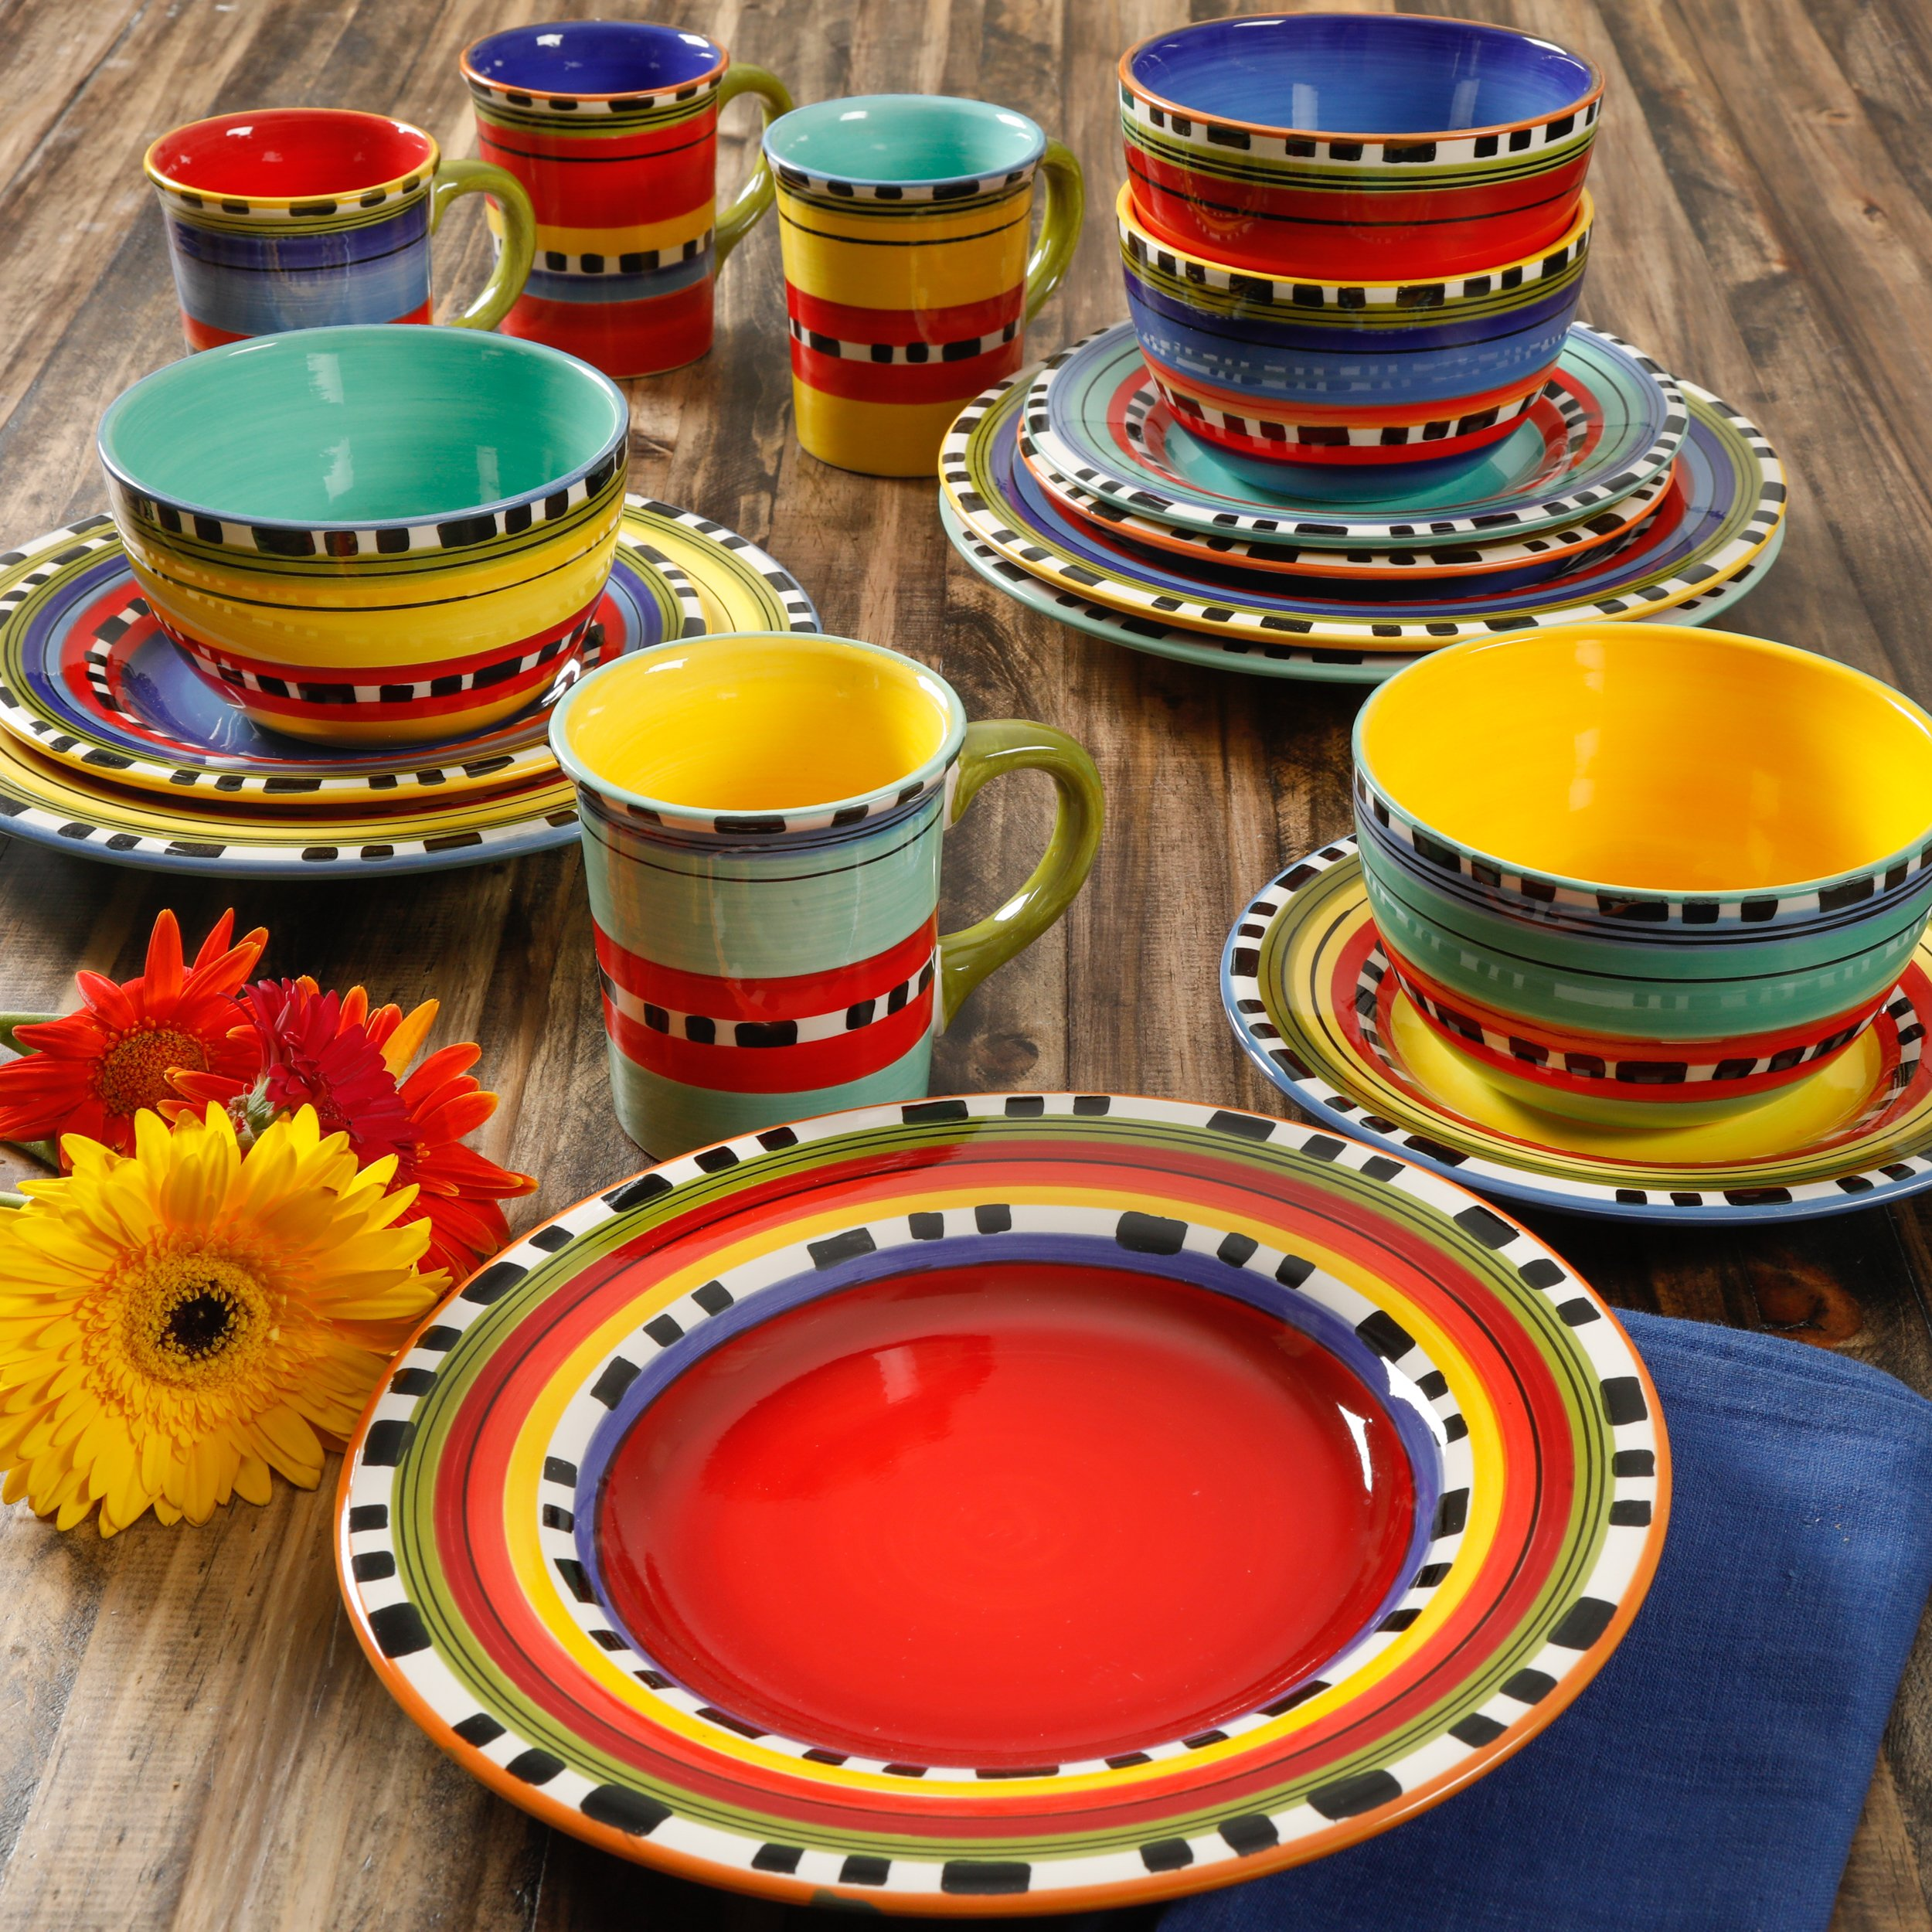 Gibson Home Pueblo Springs Handpainted 16-Piece Dinnerware Set - Picante